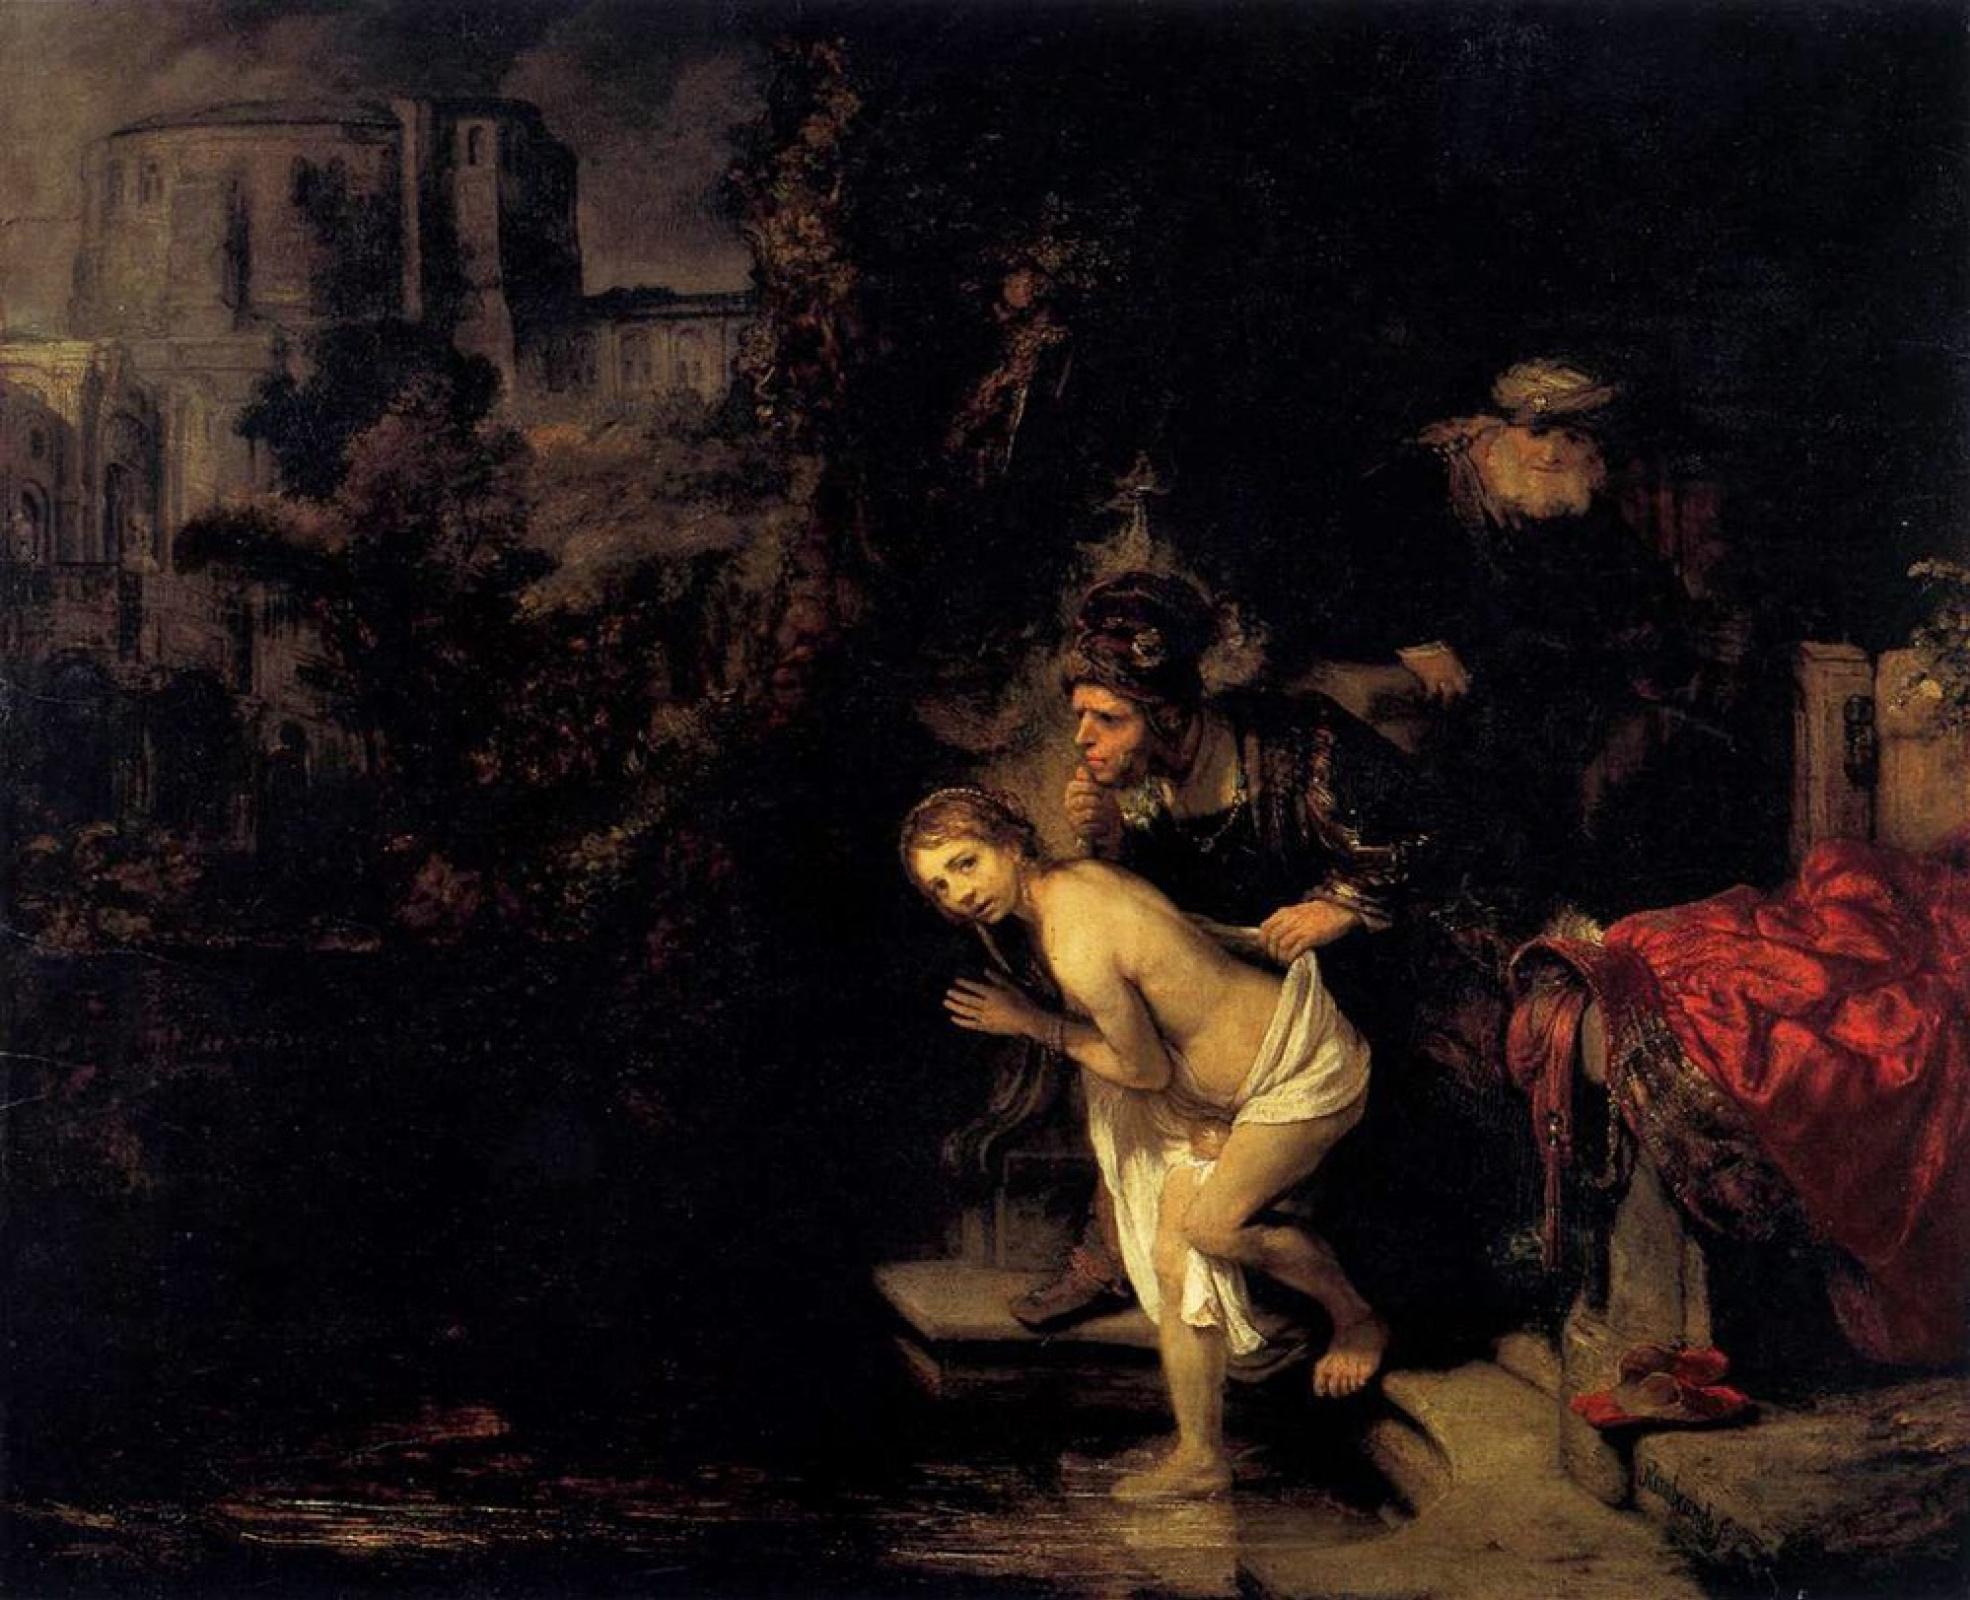 Рембрандт Харменс ван Рейн. Сусанна и старцы